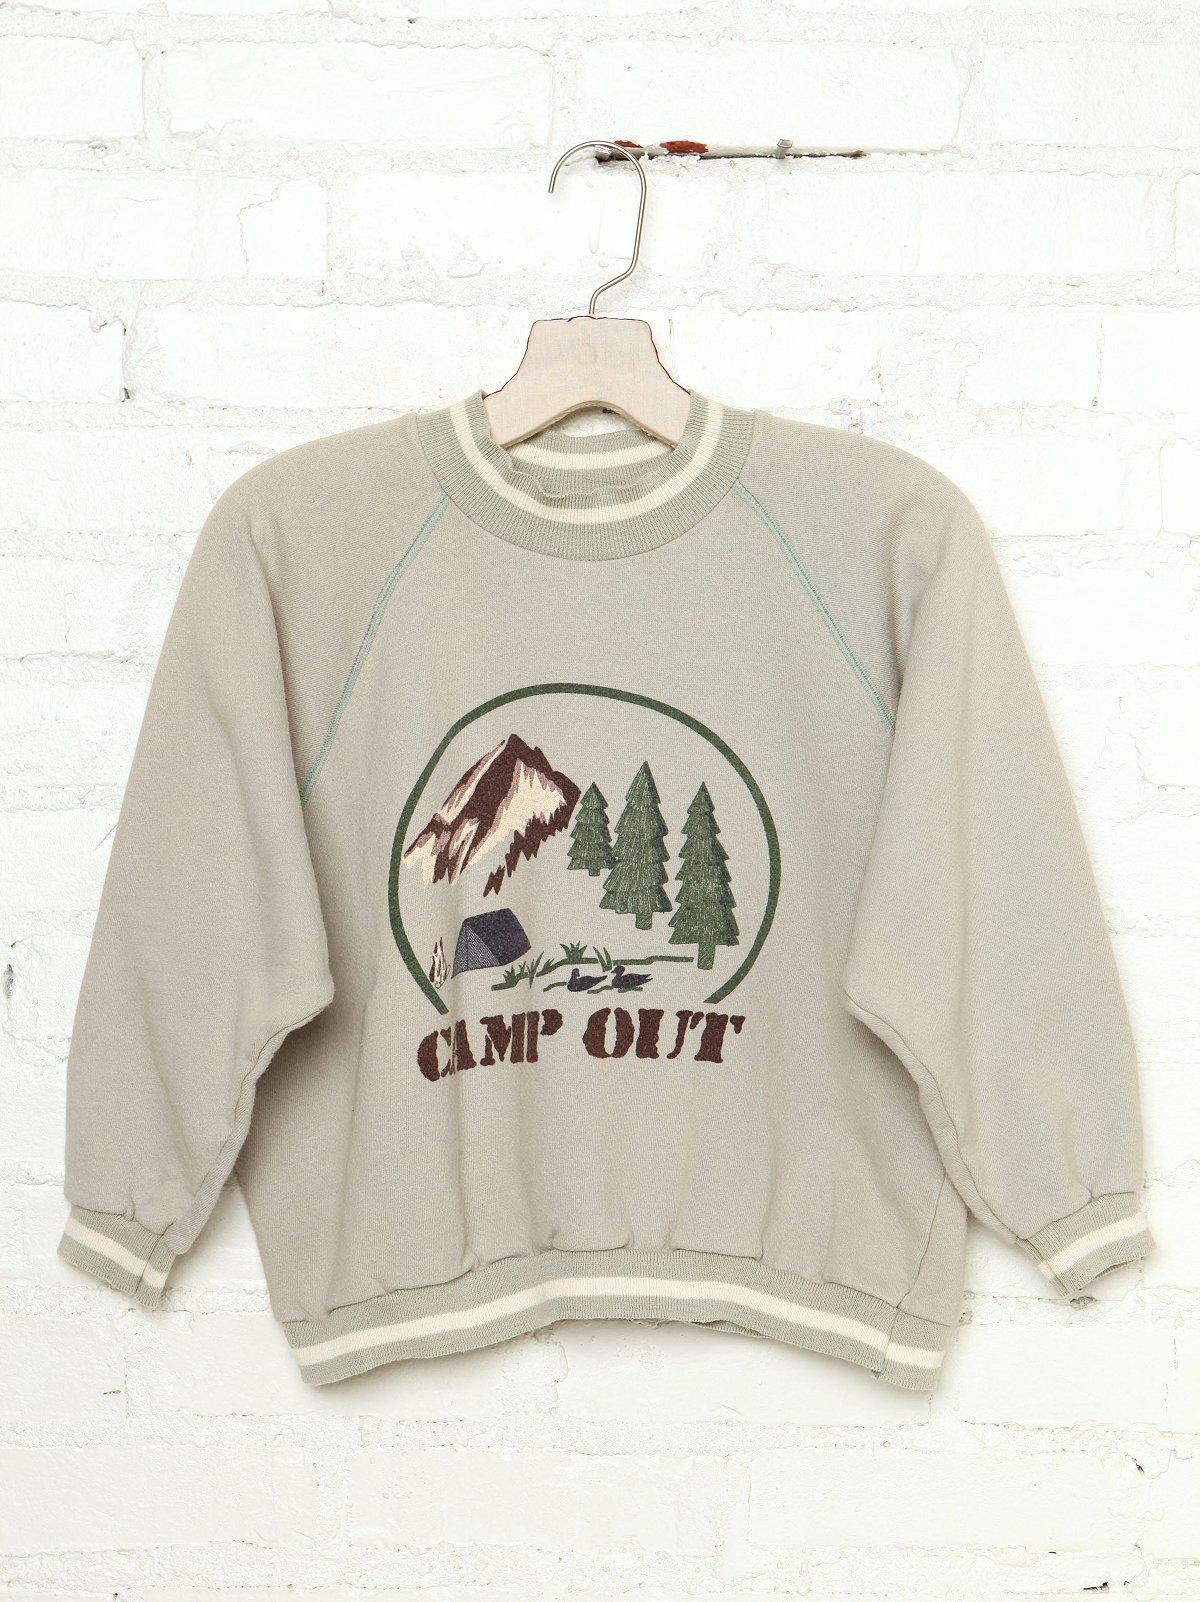 Vintage Camp Out Sweatshirt